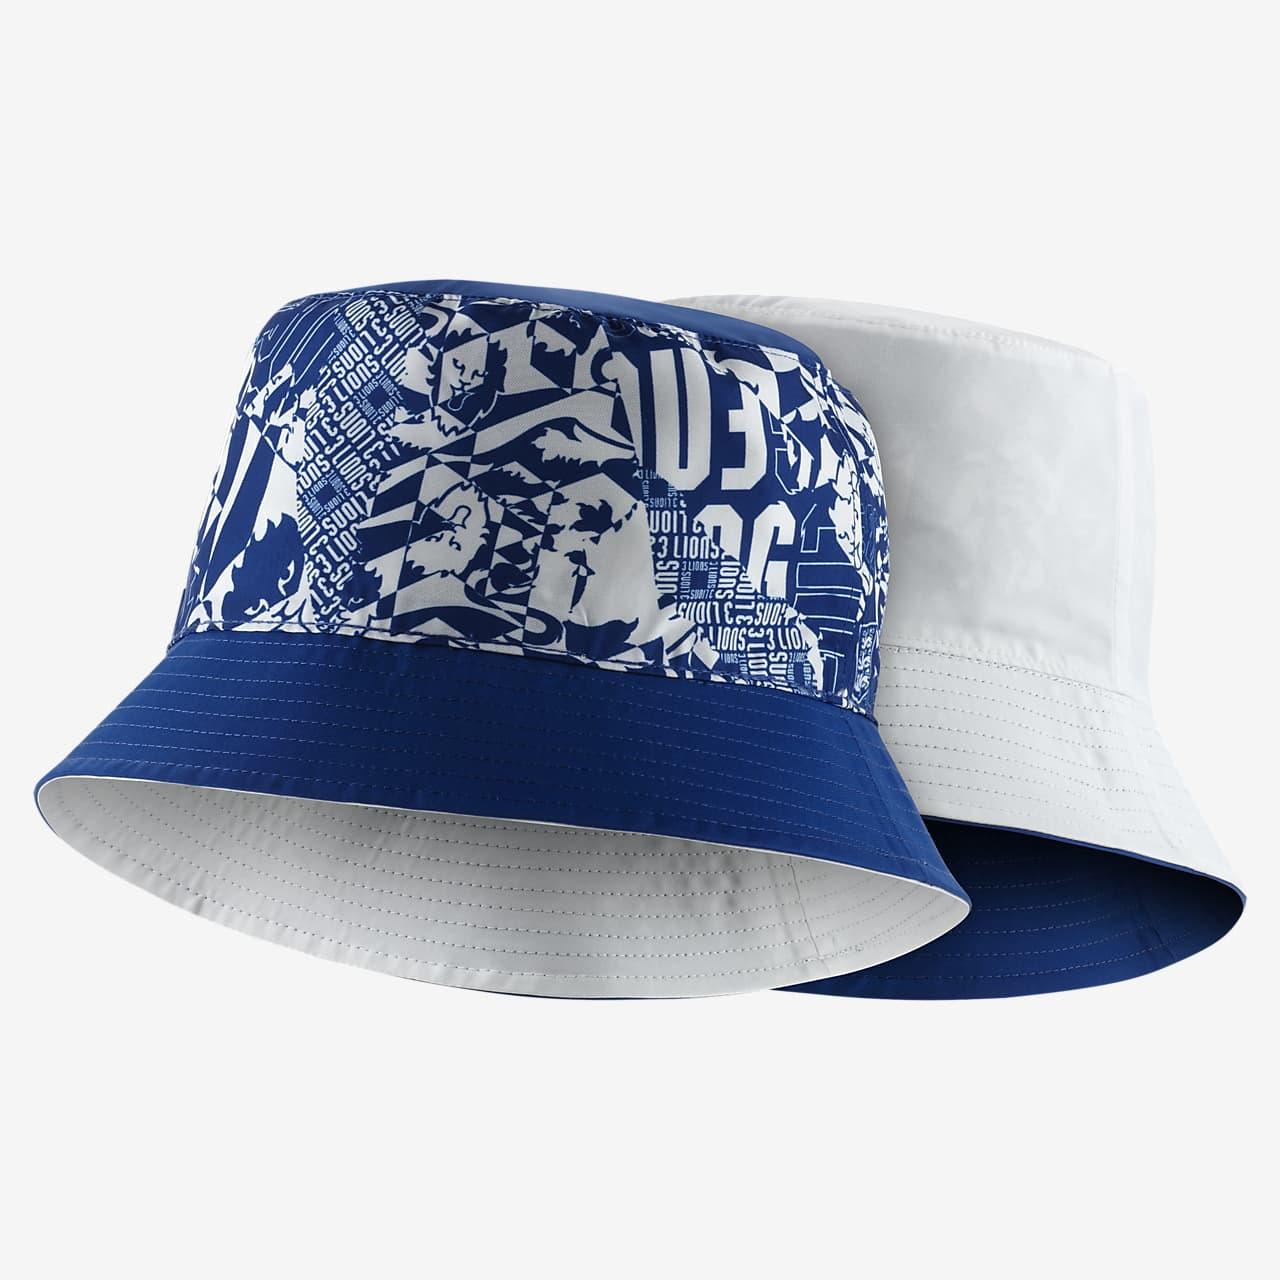 England Reversible Bucket Hat